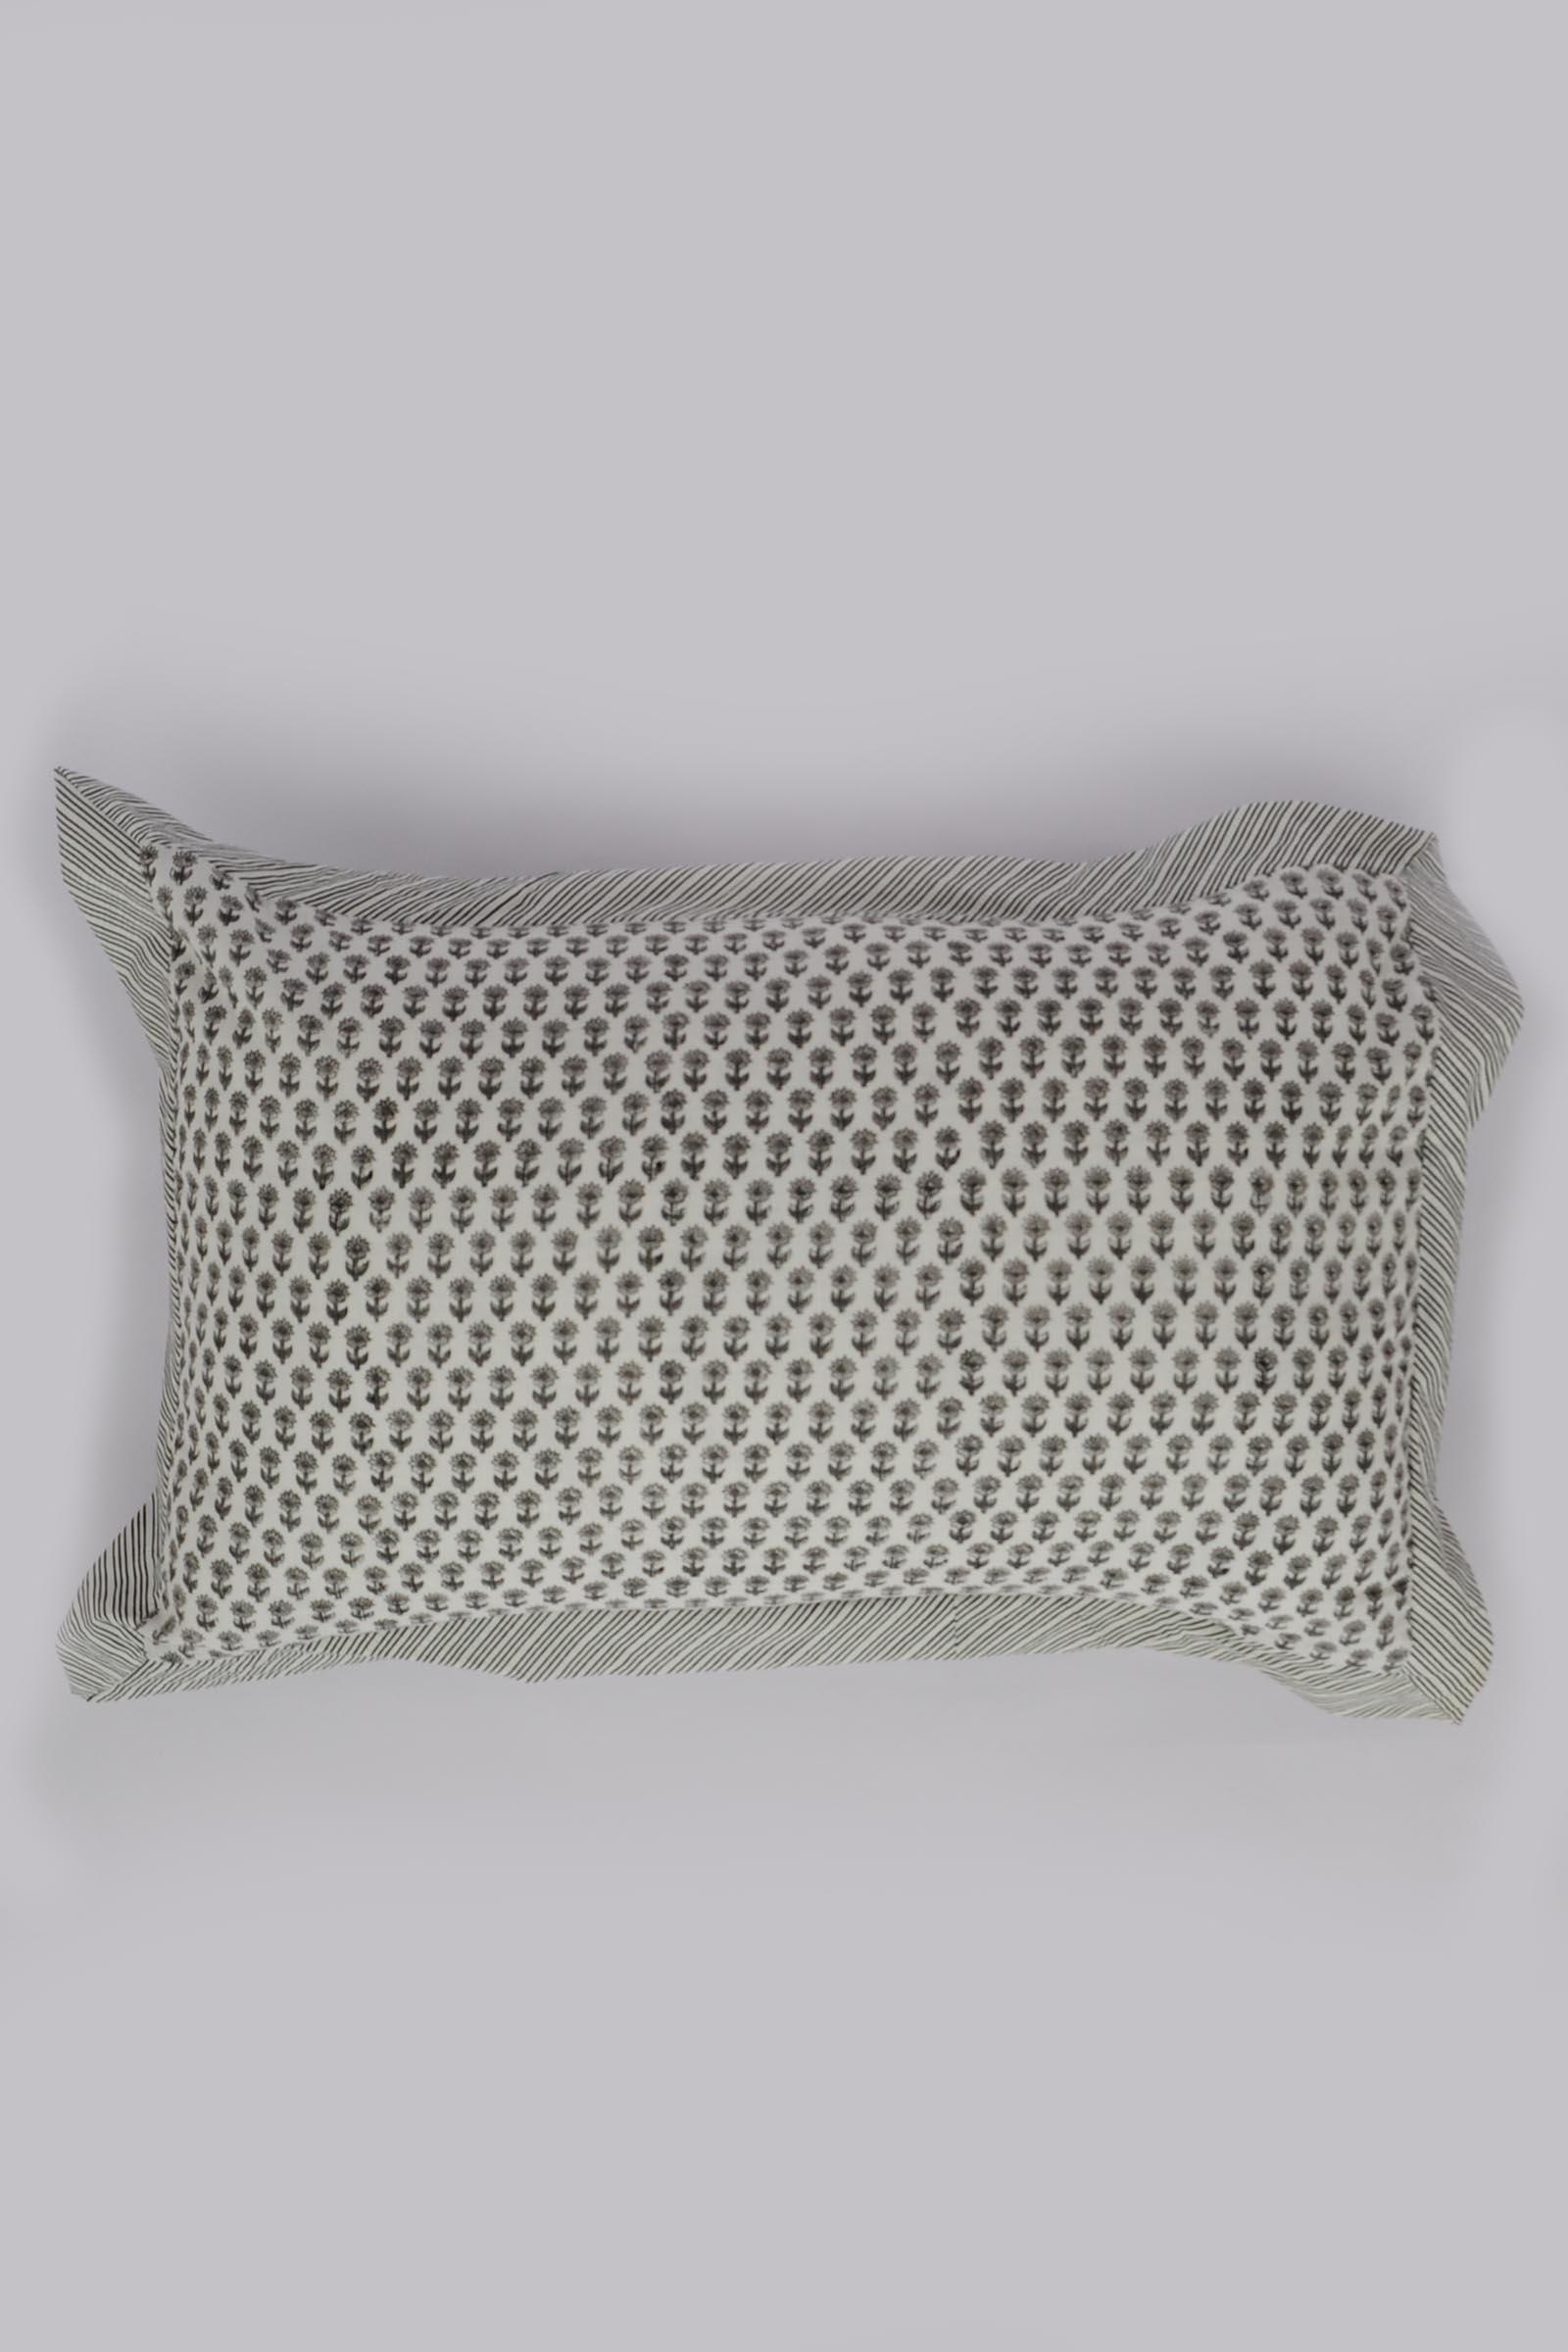 Lotus Sonata Pillow Cover Set Of 2